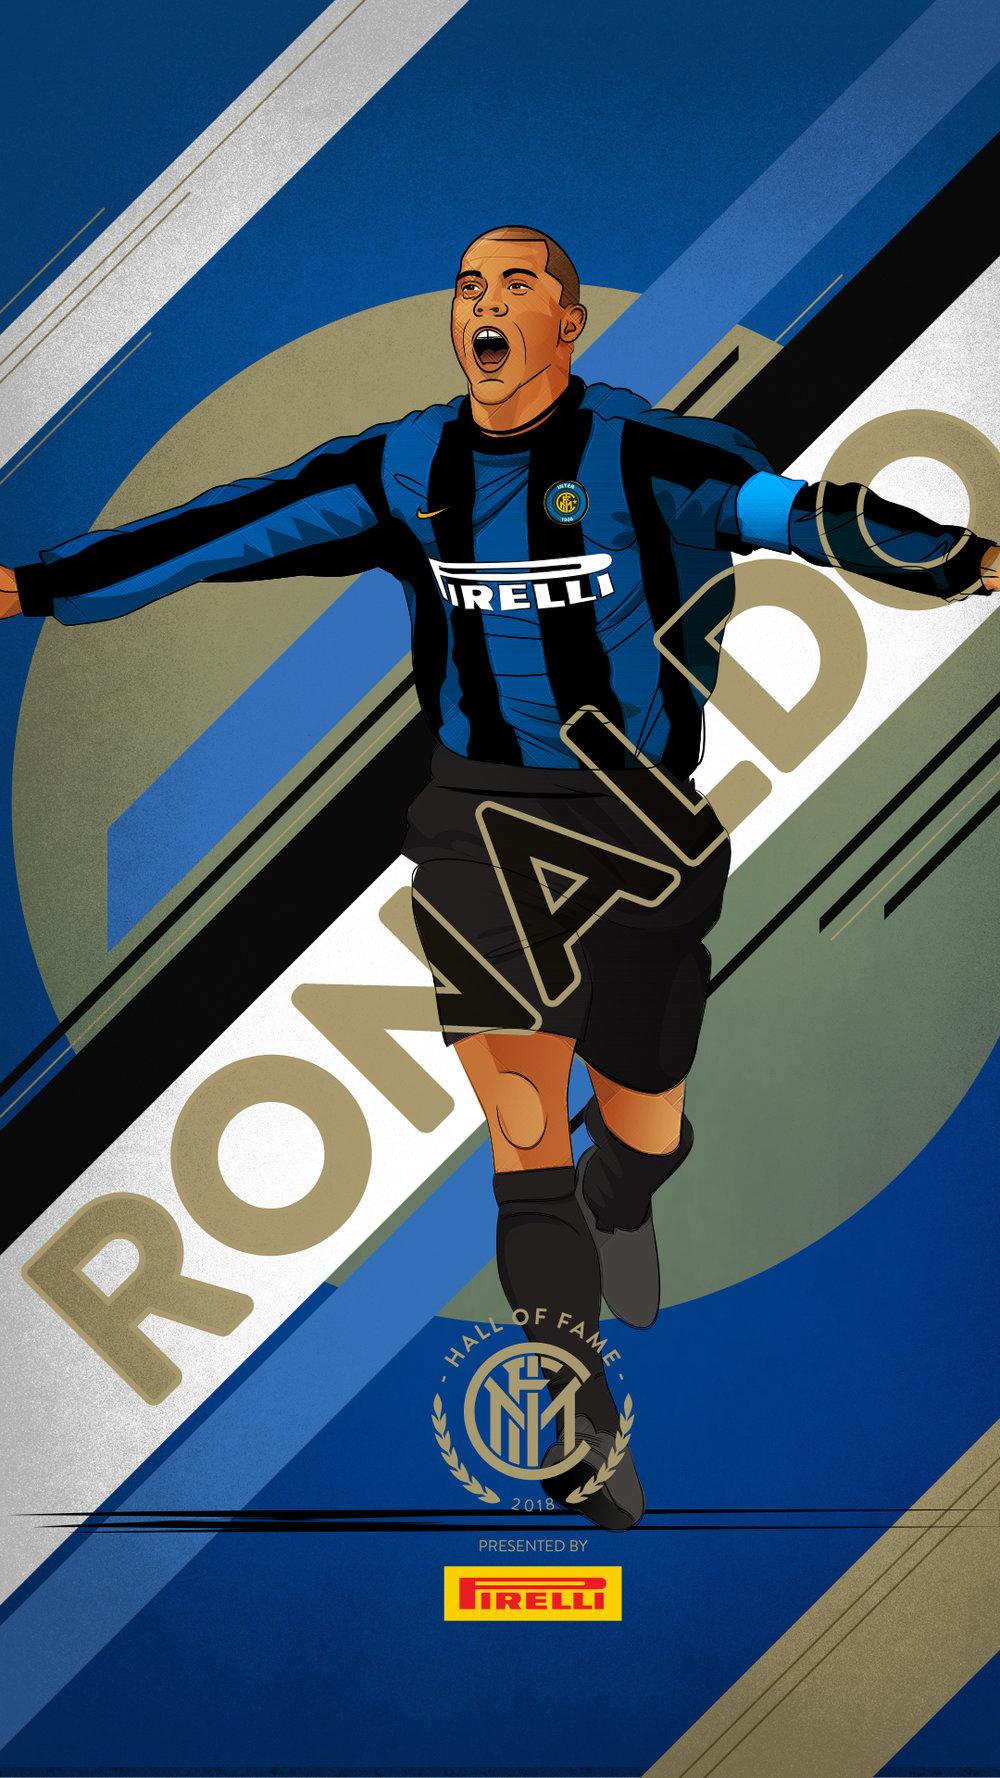 Ronaldo_1080x1920_Insta-Story.jpg